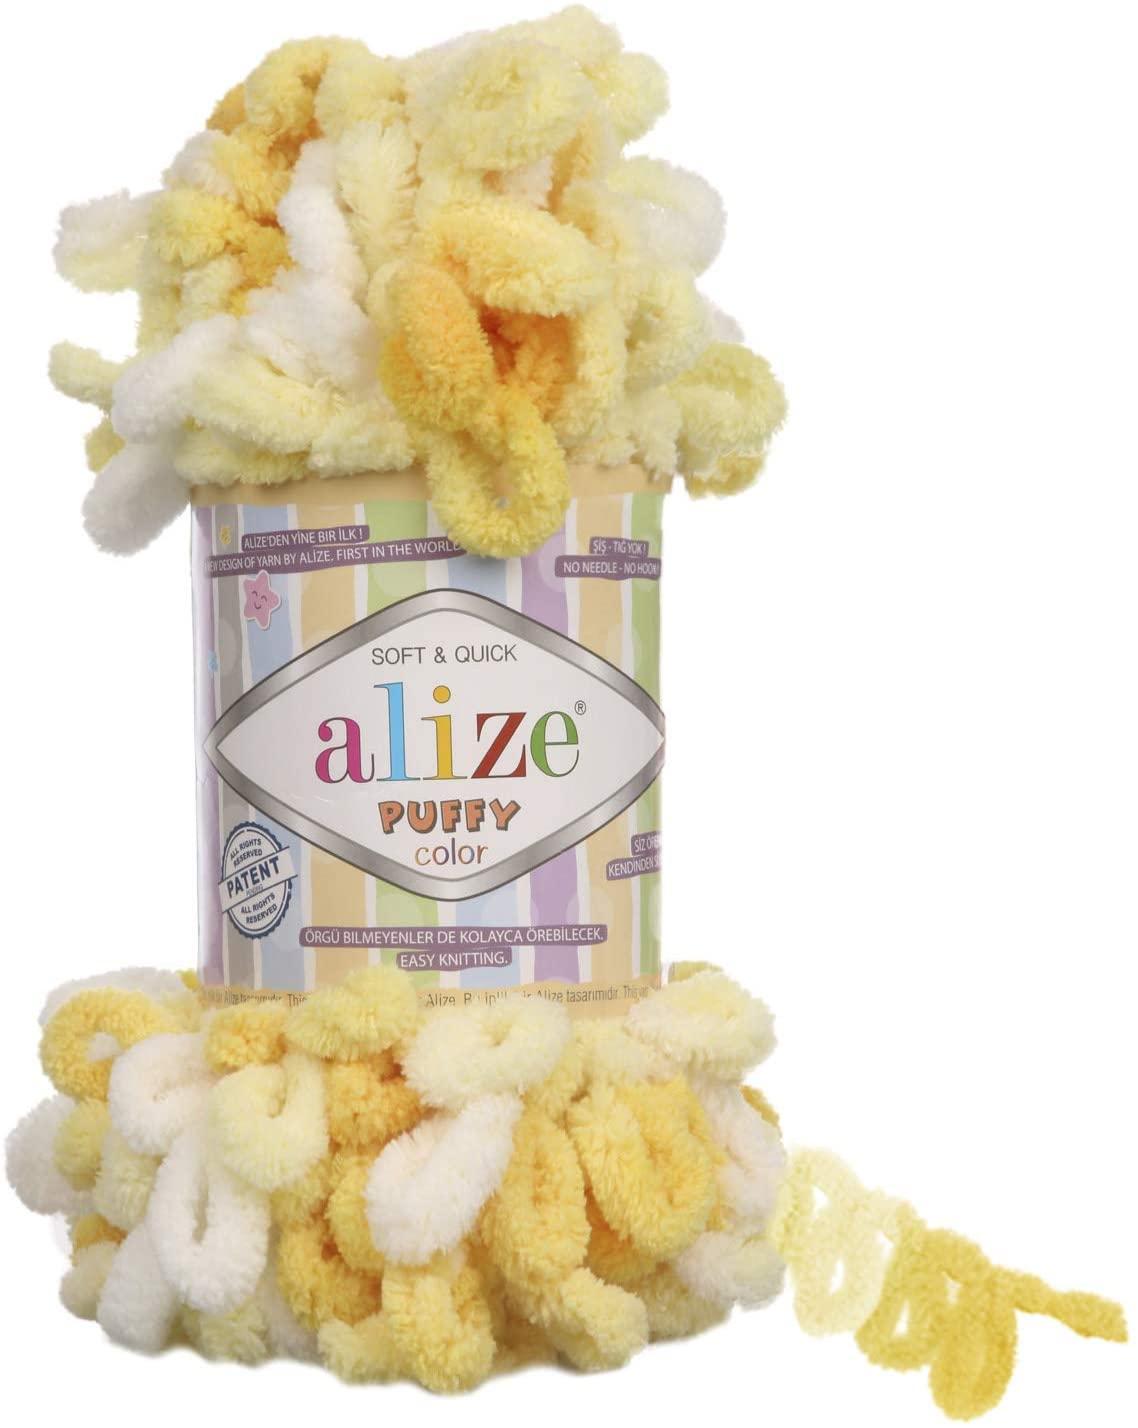 Alize Puffy Color Yarn Baby Blanket Yarn Lot of 5 skeins 500gr 50yds 100% Micropolyester Soft Yarn Baby Blanket Yarn Hand Knitting Yarn Super Chunky Bulky Woven Worested Yarn (5921)